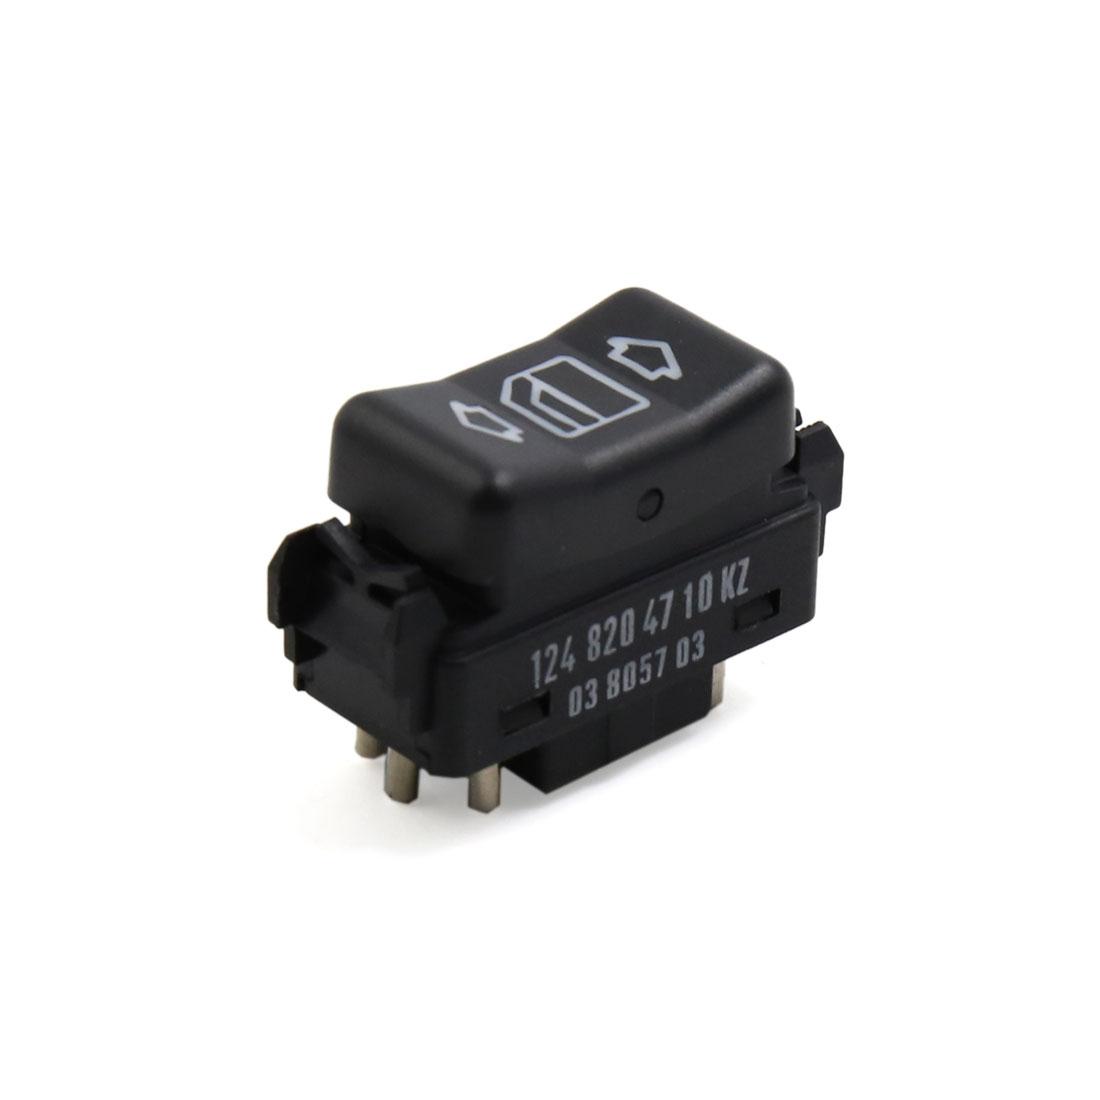 Car Power Window Switch 1248204710 for Mercedes Benz 500E 300SE 280SE 260E 190E